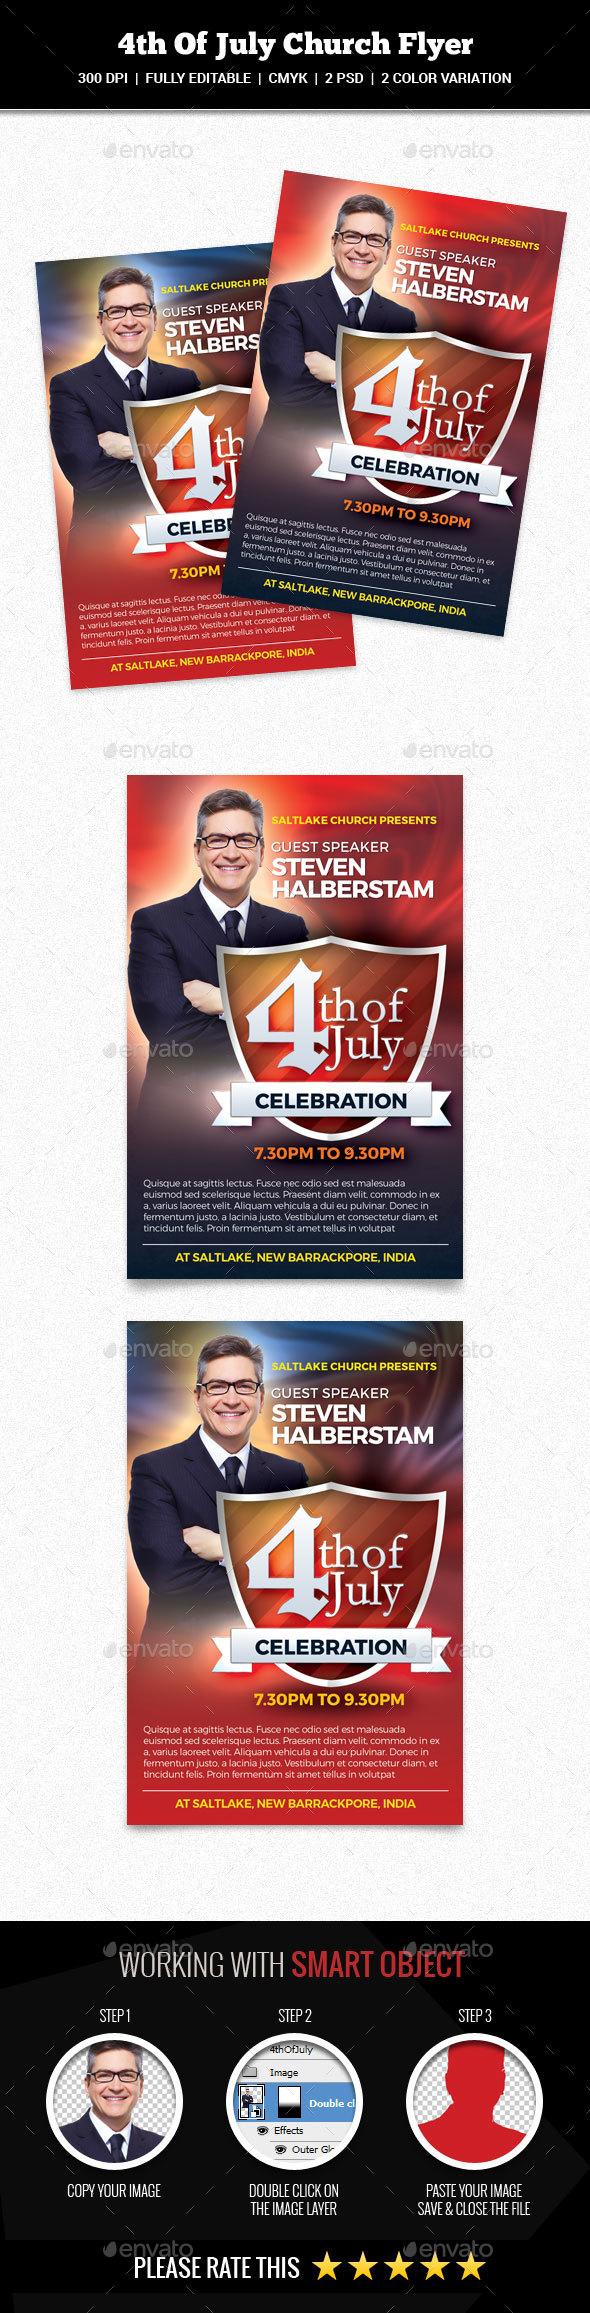 4th Of July Church Flyer - Church Flyers